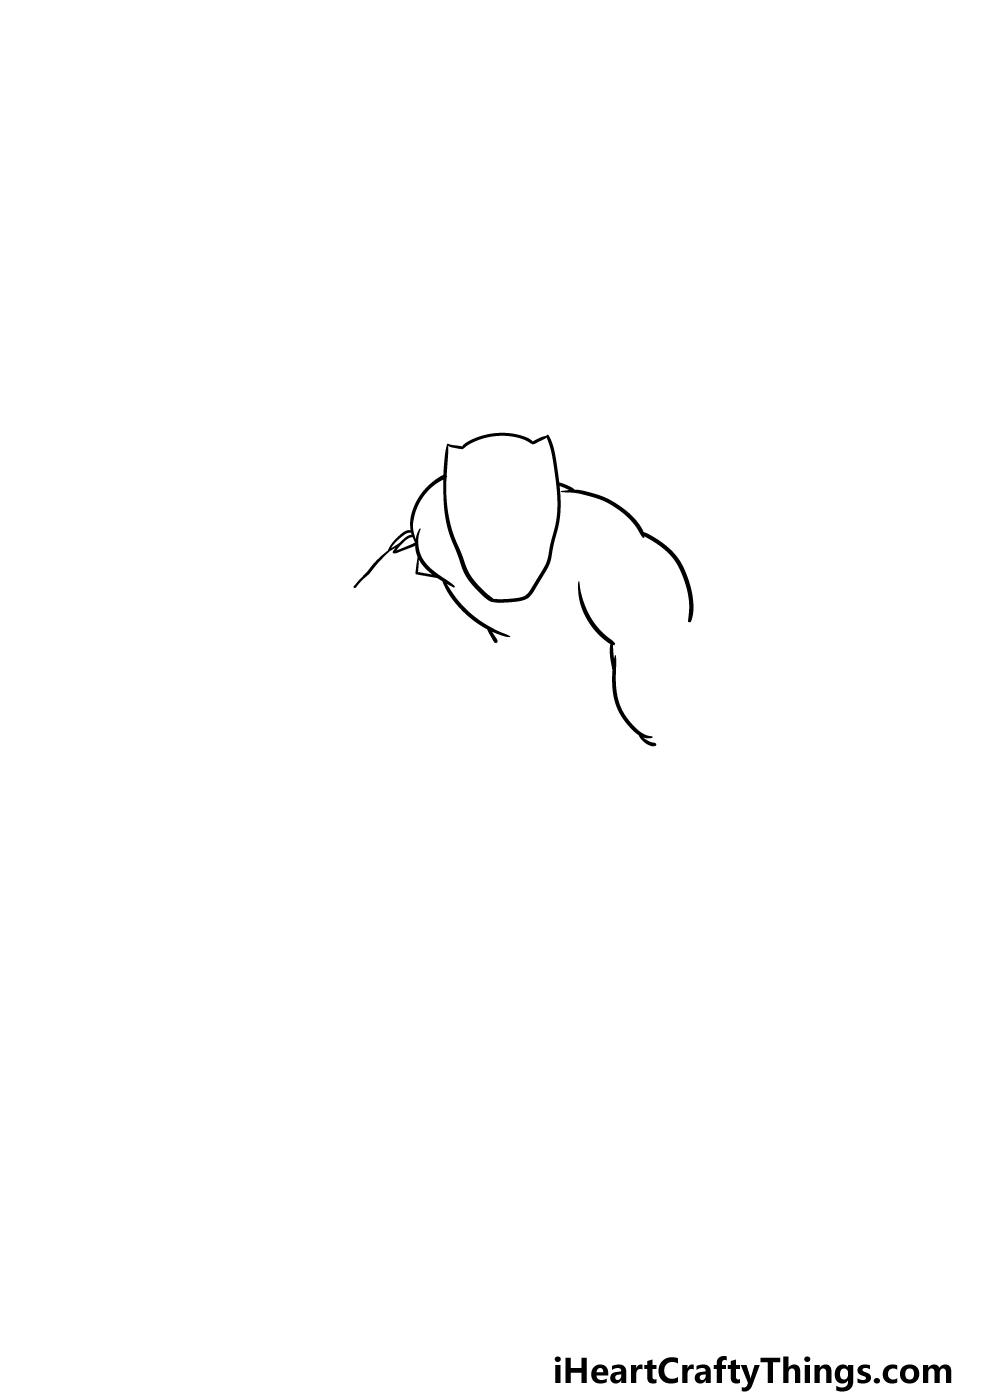 drawing Black Panther step 1